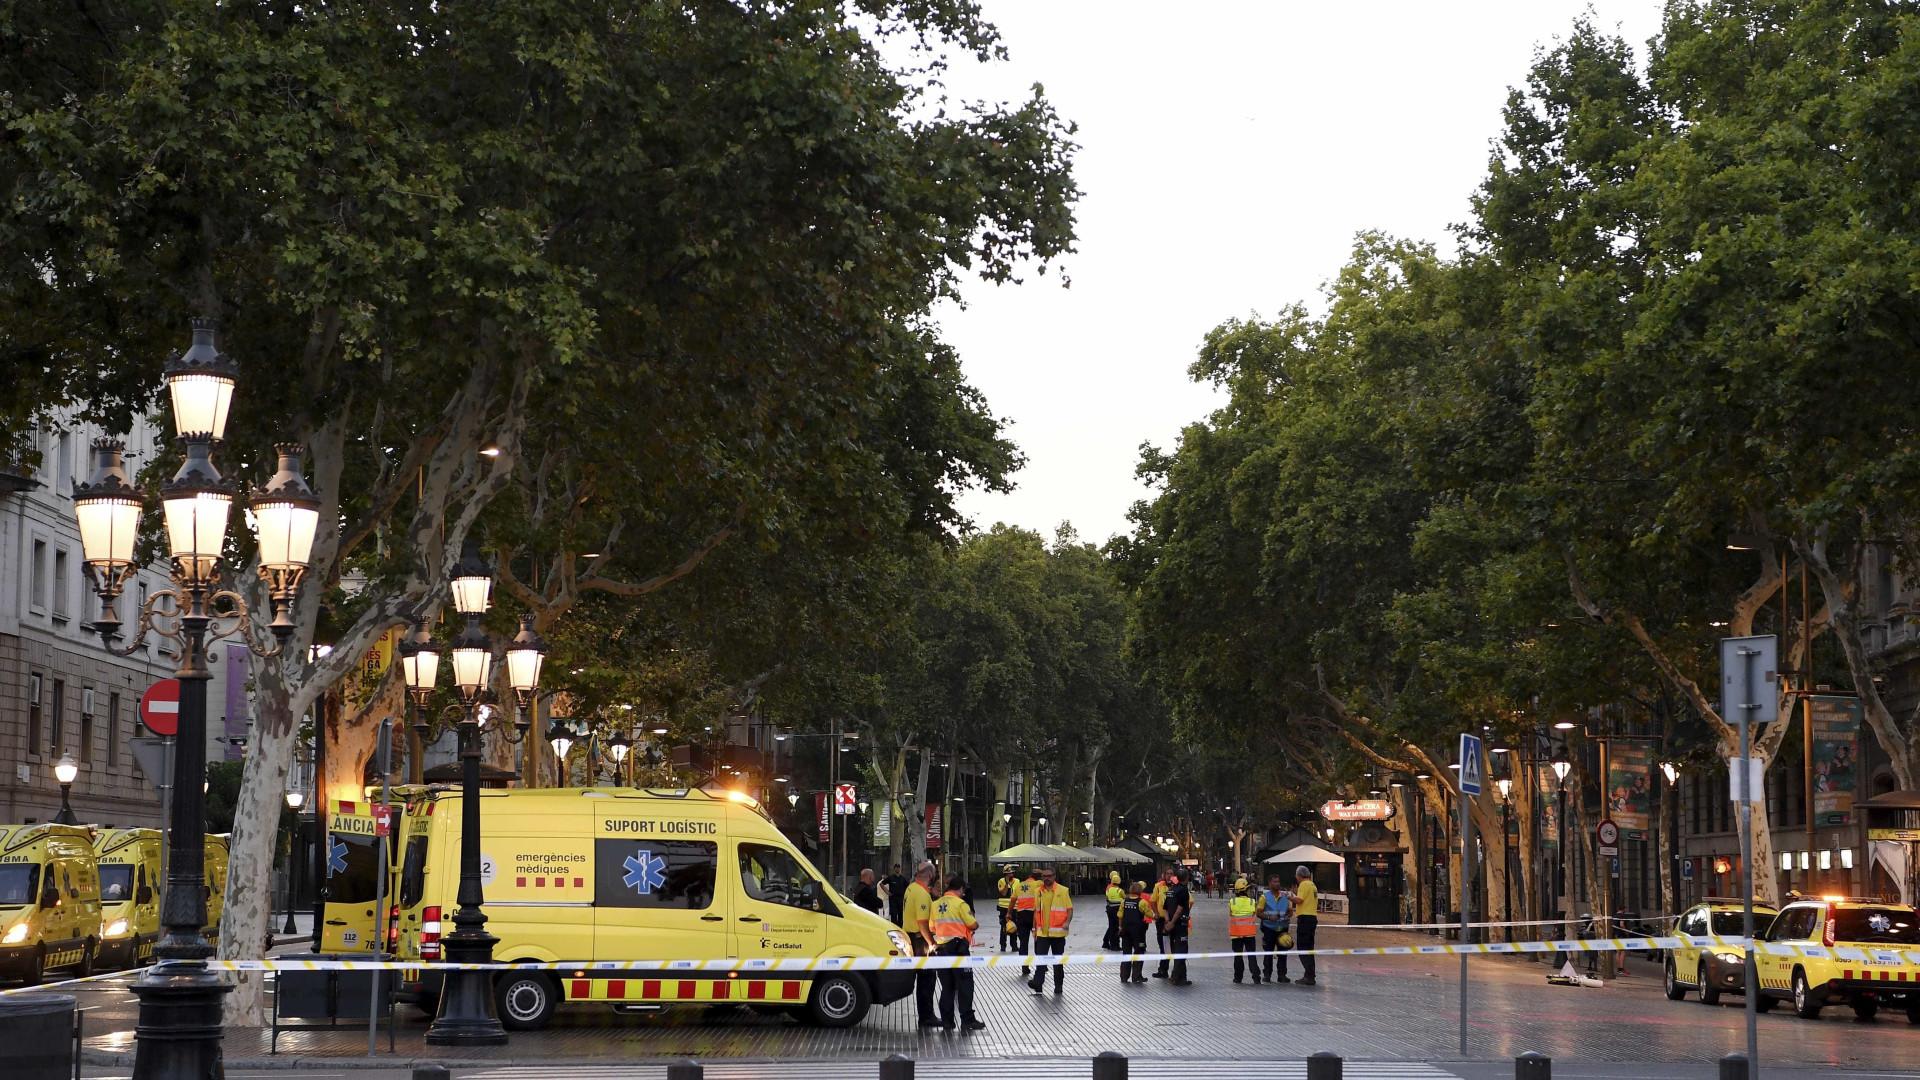 Confirmada morte de segunda portuguesa em ataque de Barcelona